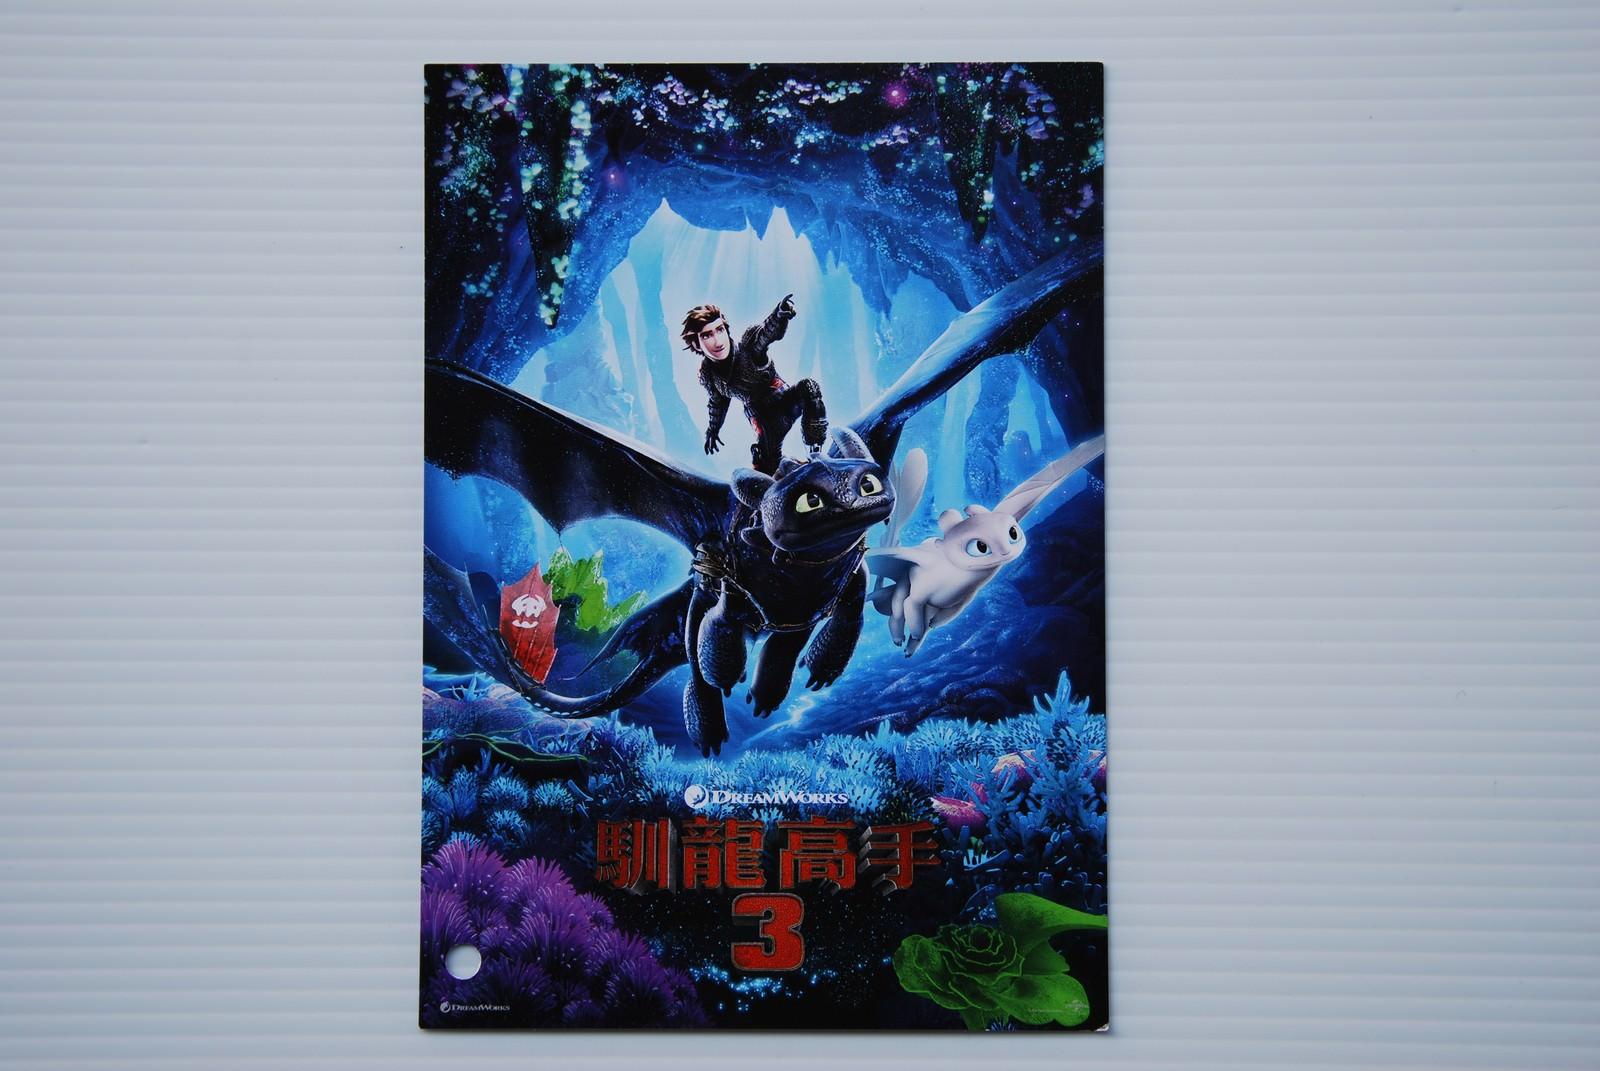 Movie, How to Train Your Dragon: The Hidden World(美國, 2019年) / 馴龍高手3(台灣) /馴龍記3(香港) / 驯龙高手3(中國), 廣告看板, 特映會邀請卡